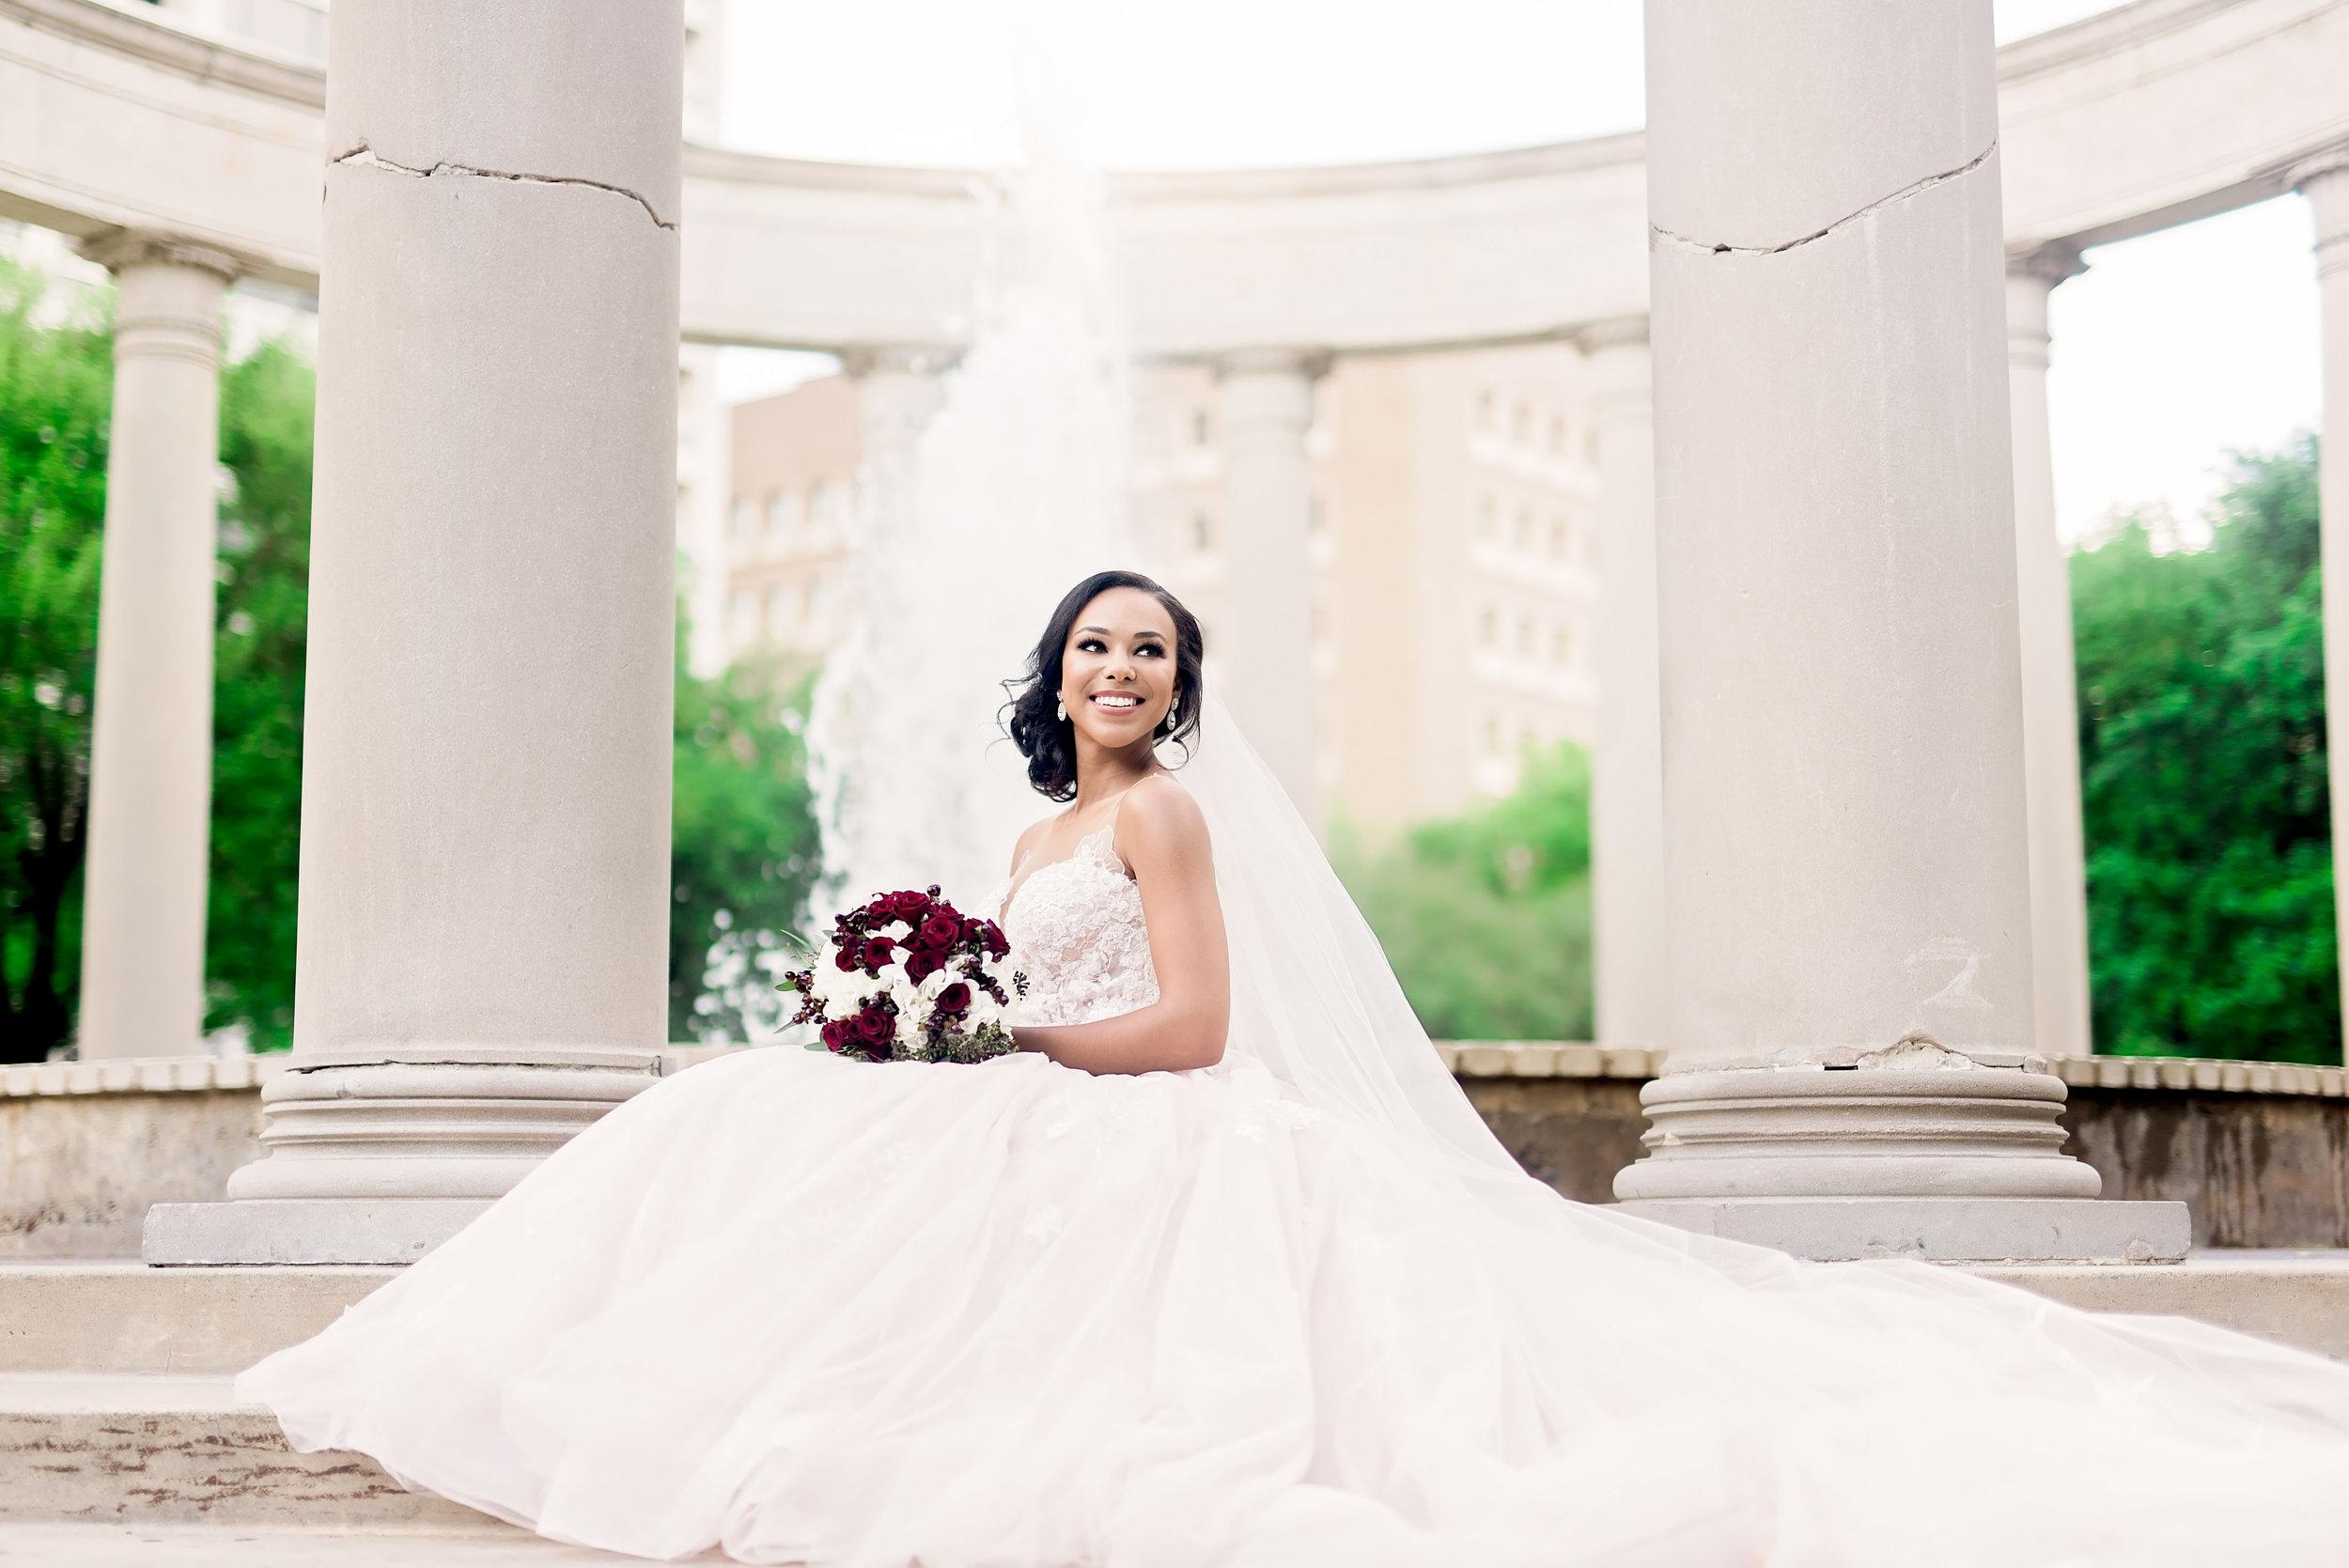 Taylor-bridal-Pharris-Photography-52.jpg